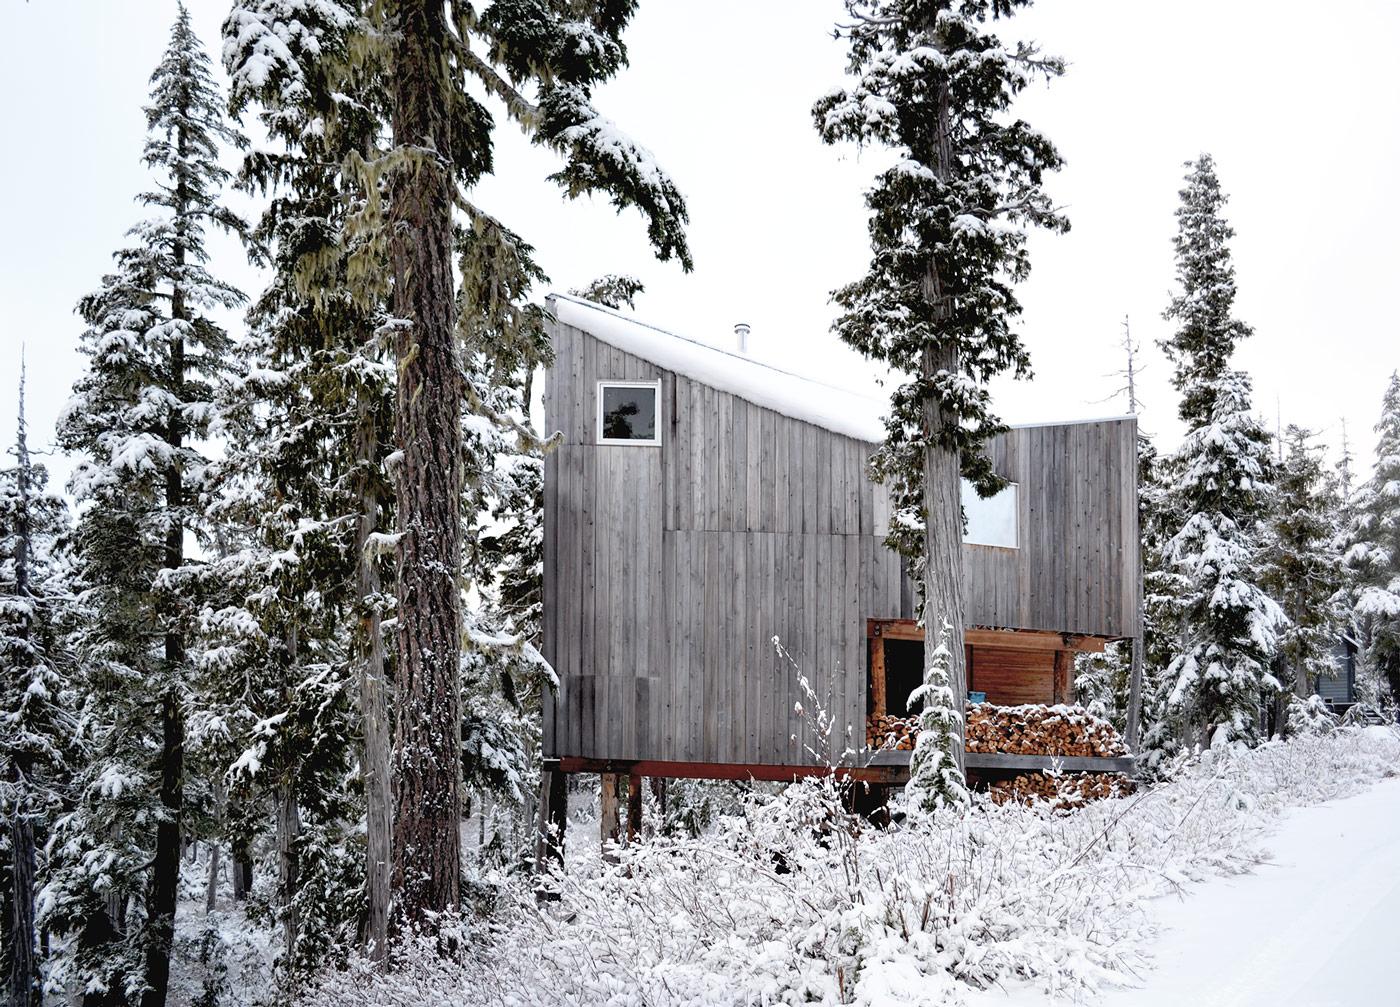 Vancouverbased Scott Scott Architects blends warm minimalism